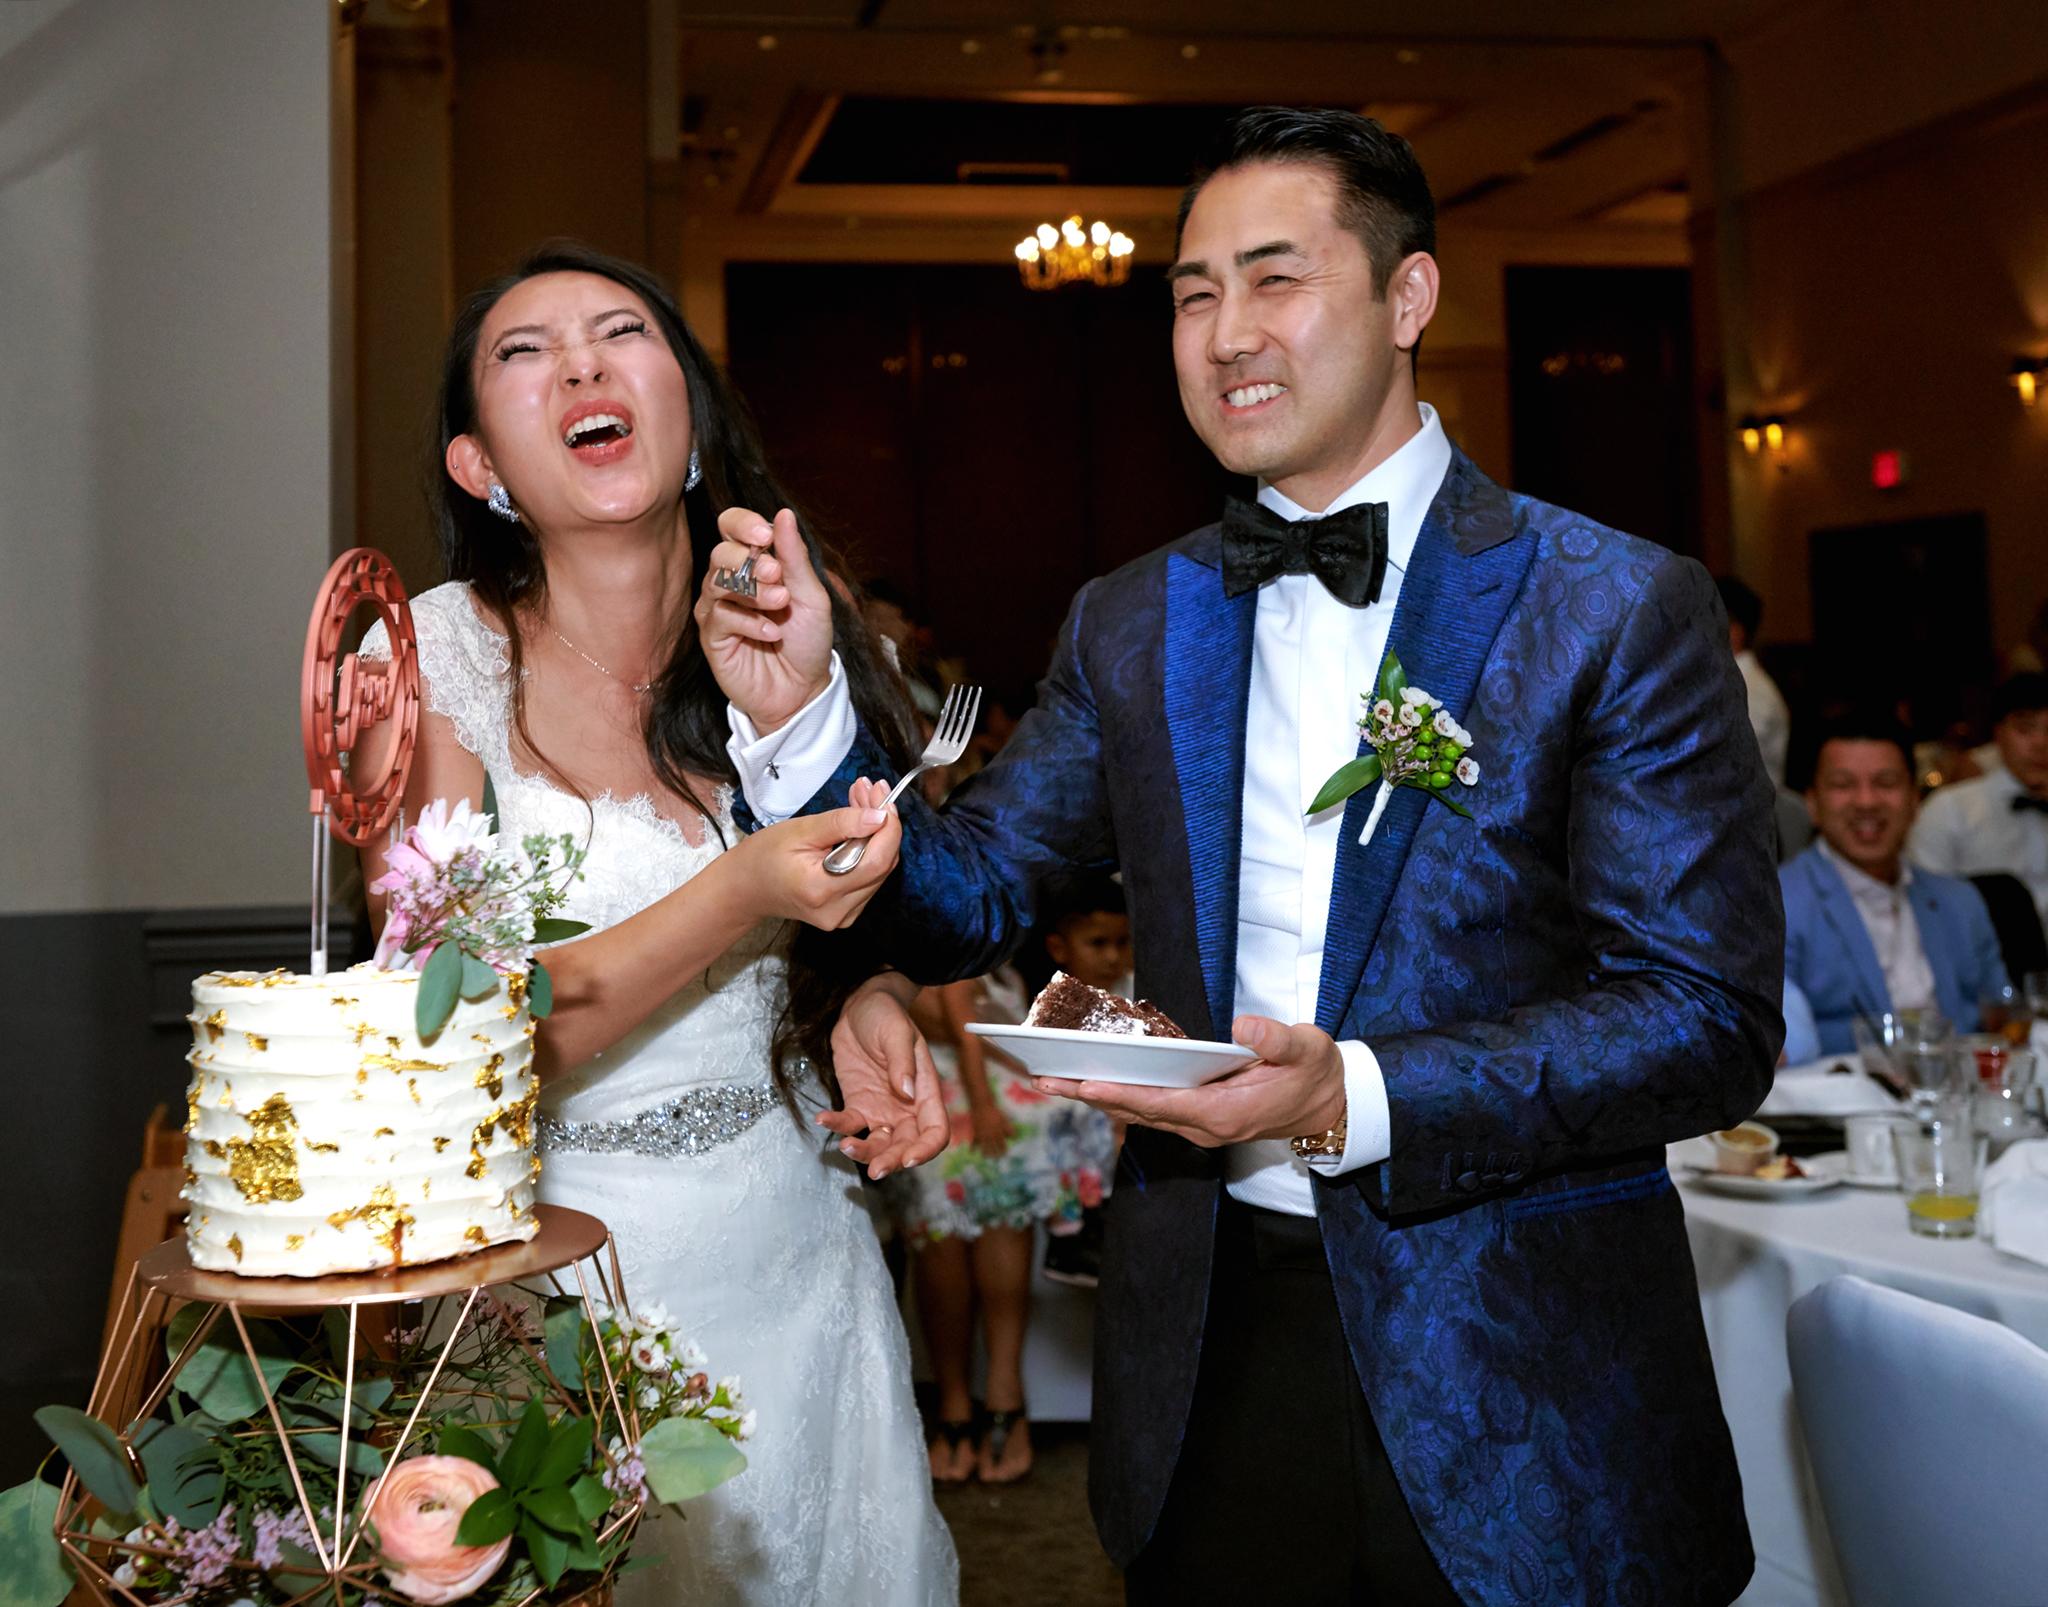 Robert Demeter Photography Swaneset wedding Vancouver